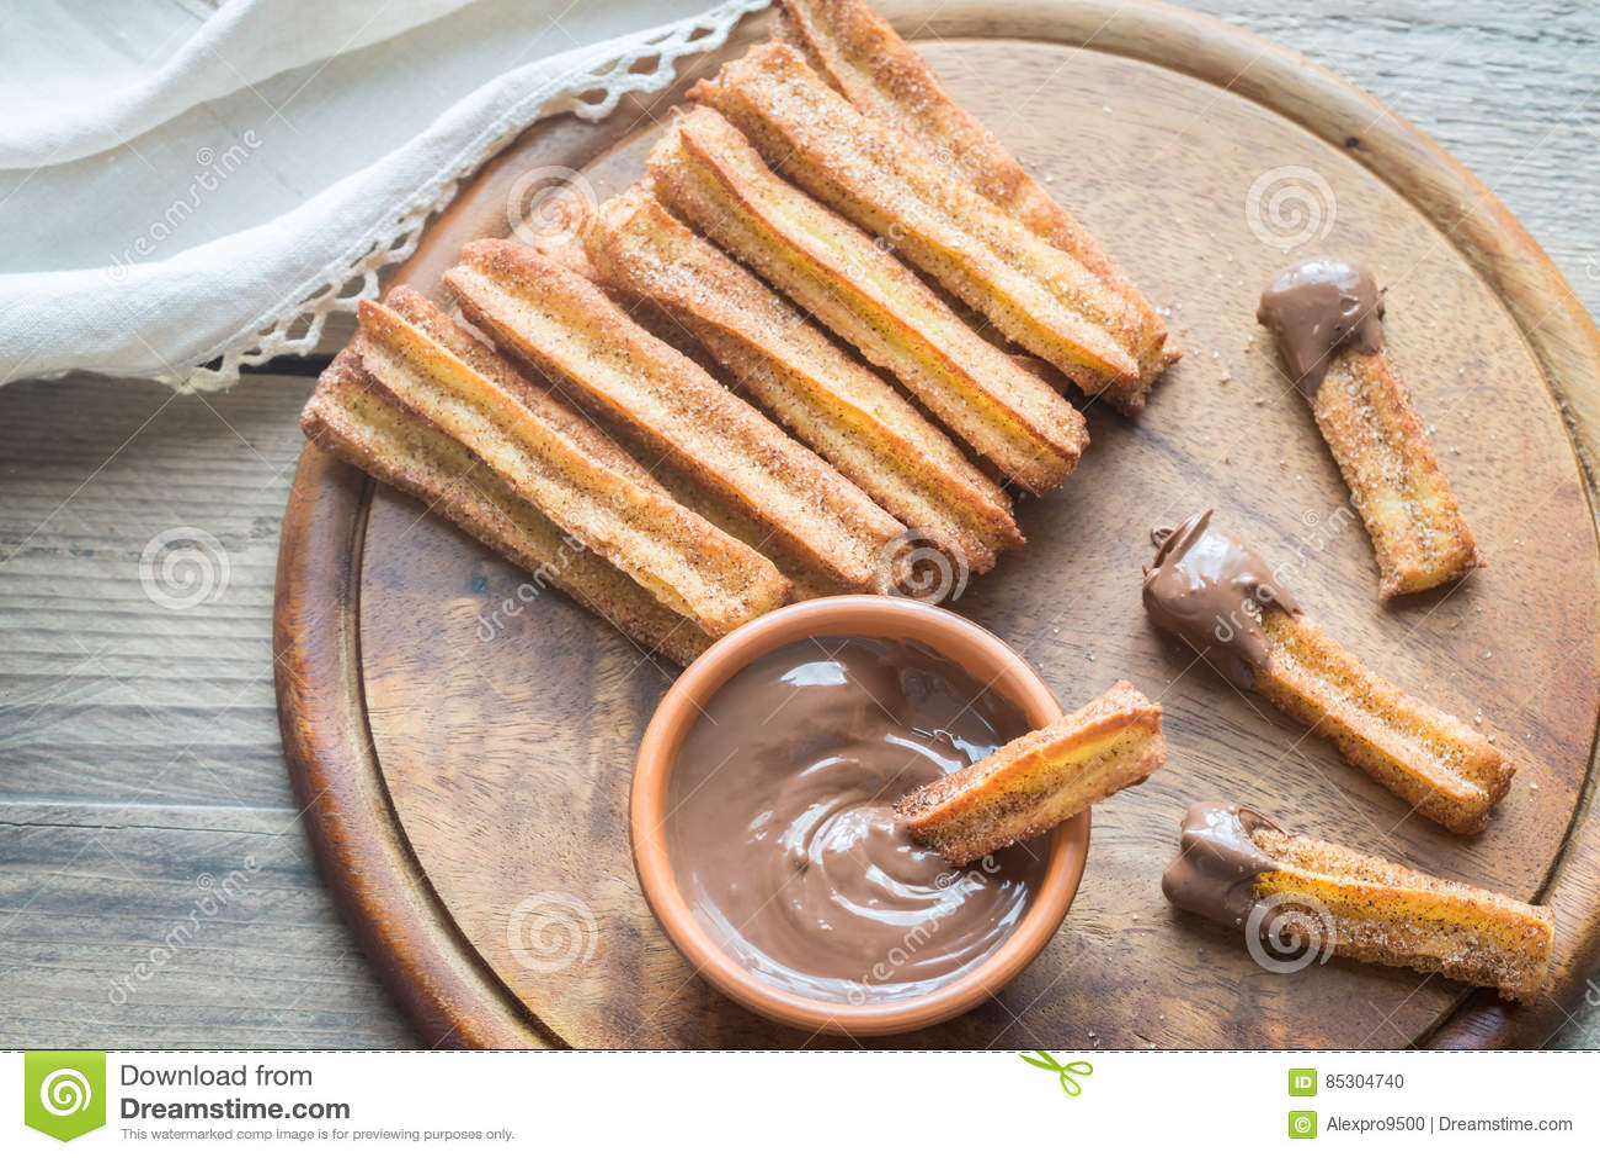 Churros -著名西班牙点心用巧克力汁